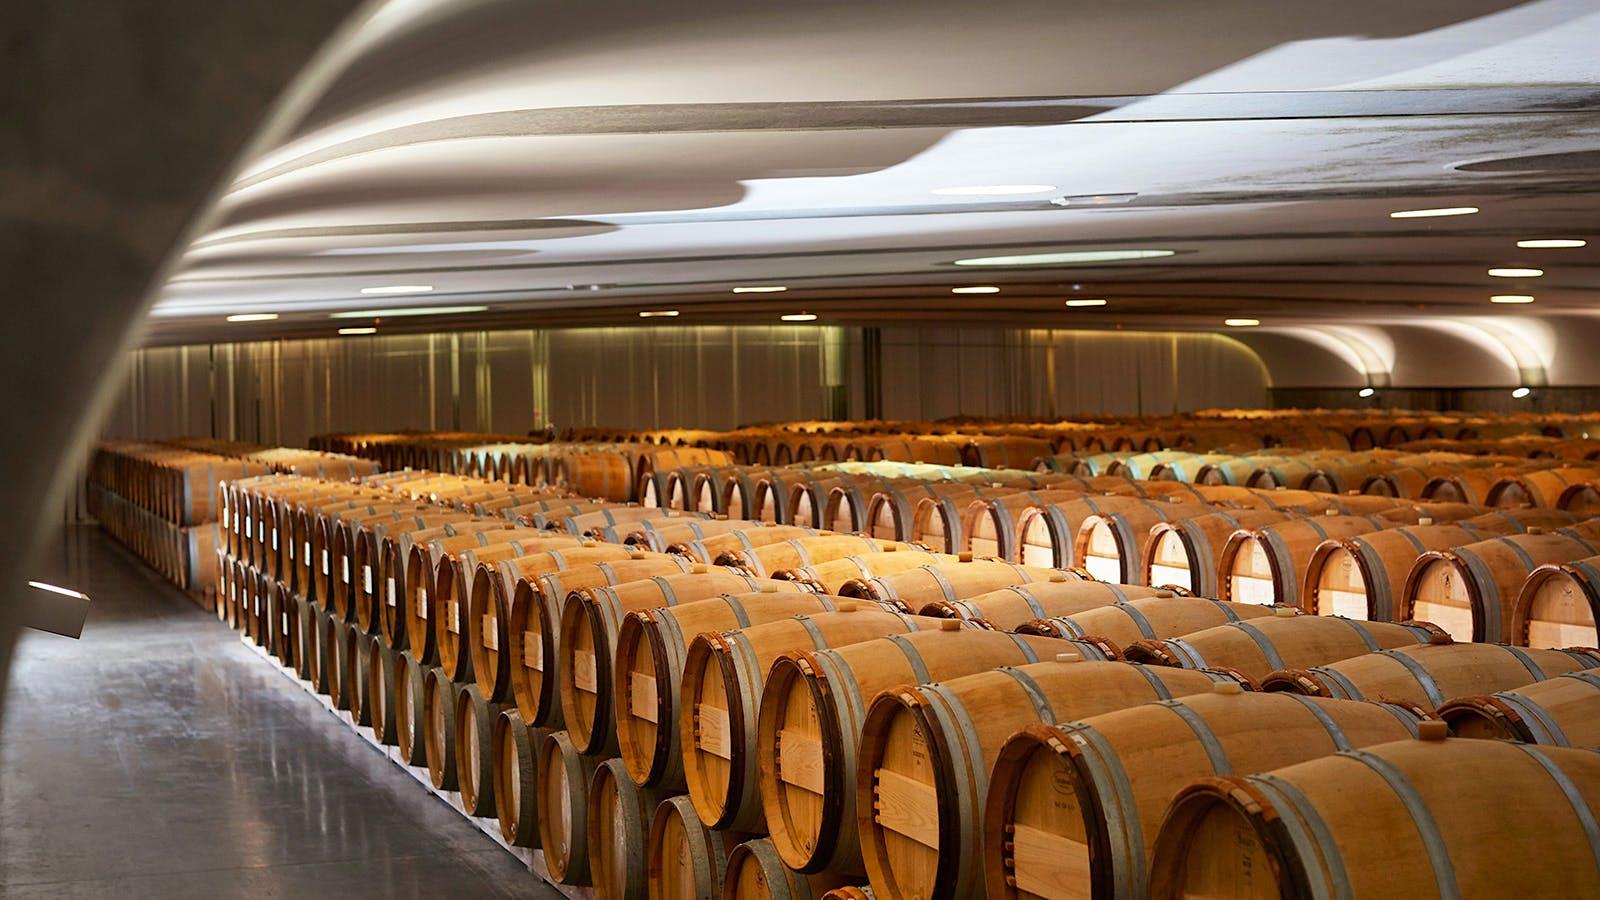 2017 Bordeaux Barrel Tasting: Alphabetical List of Red Bordeaux